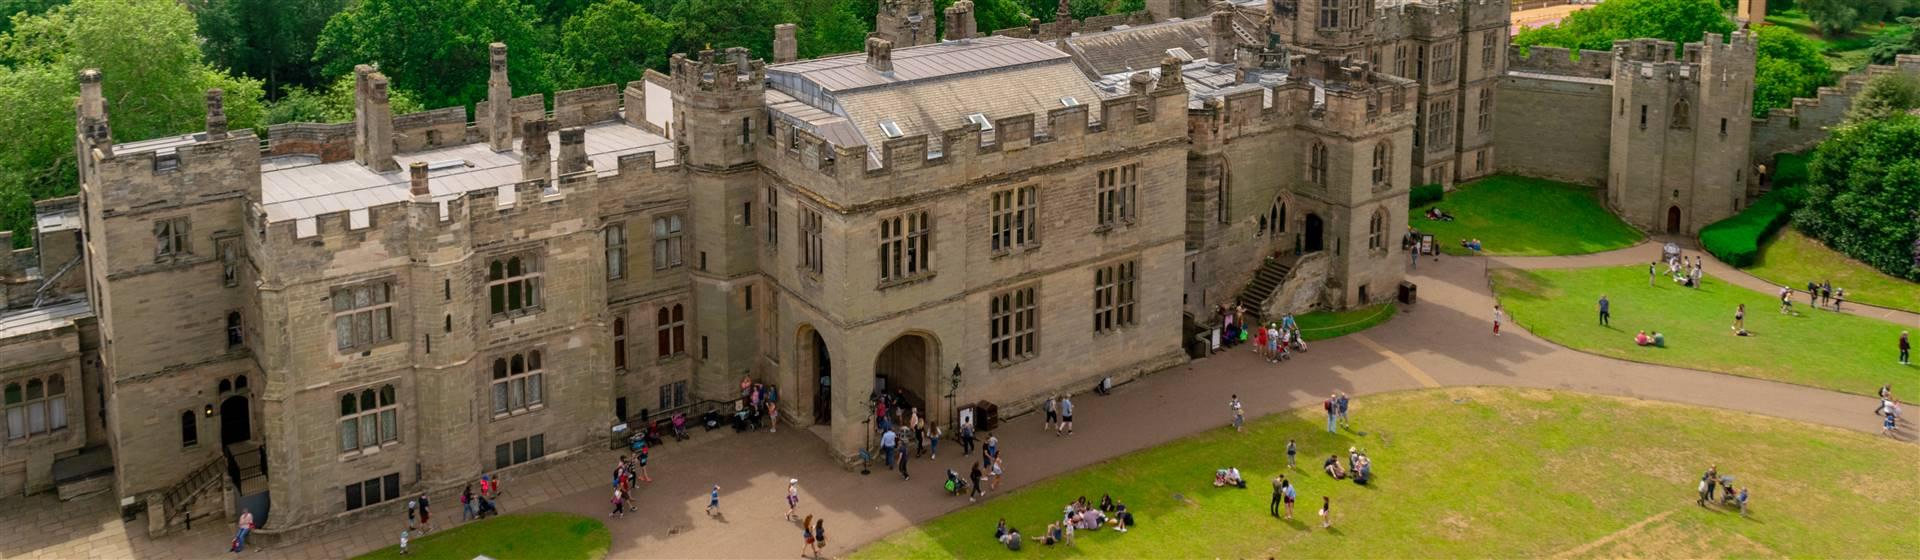 Coventry & Warwick Castle